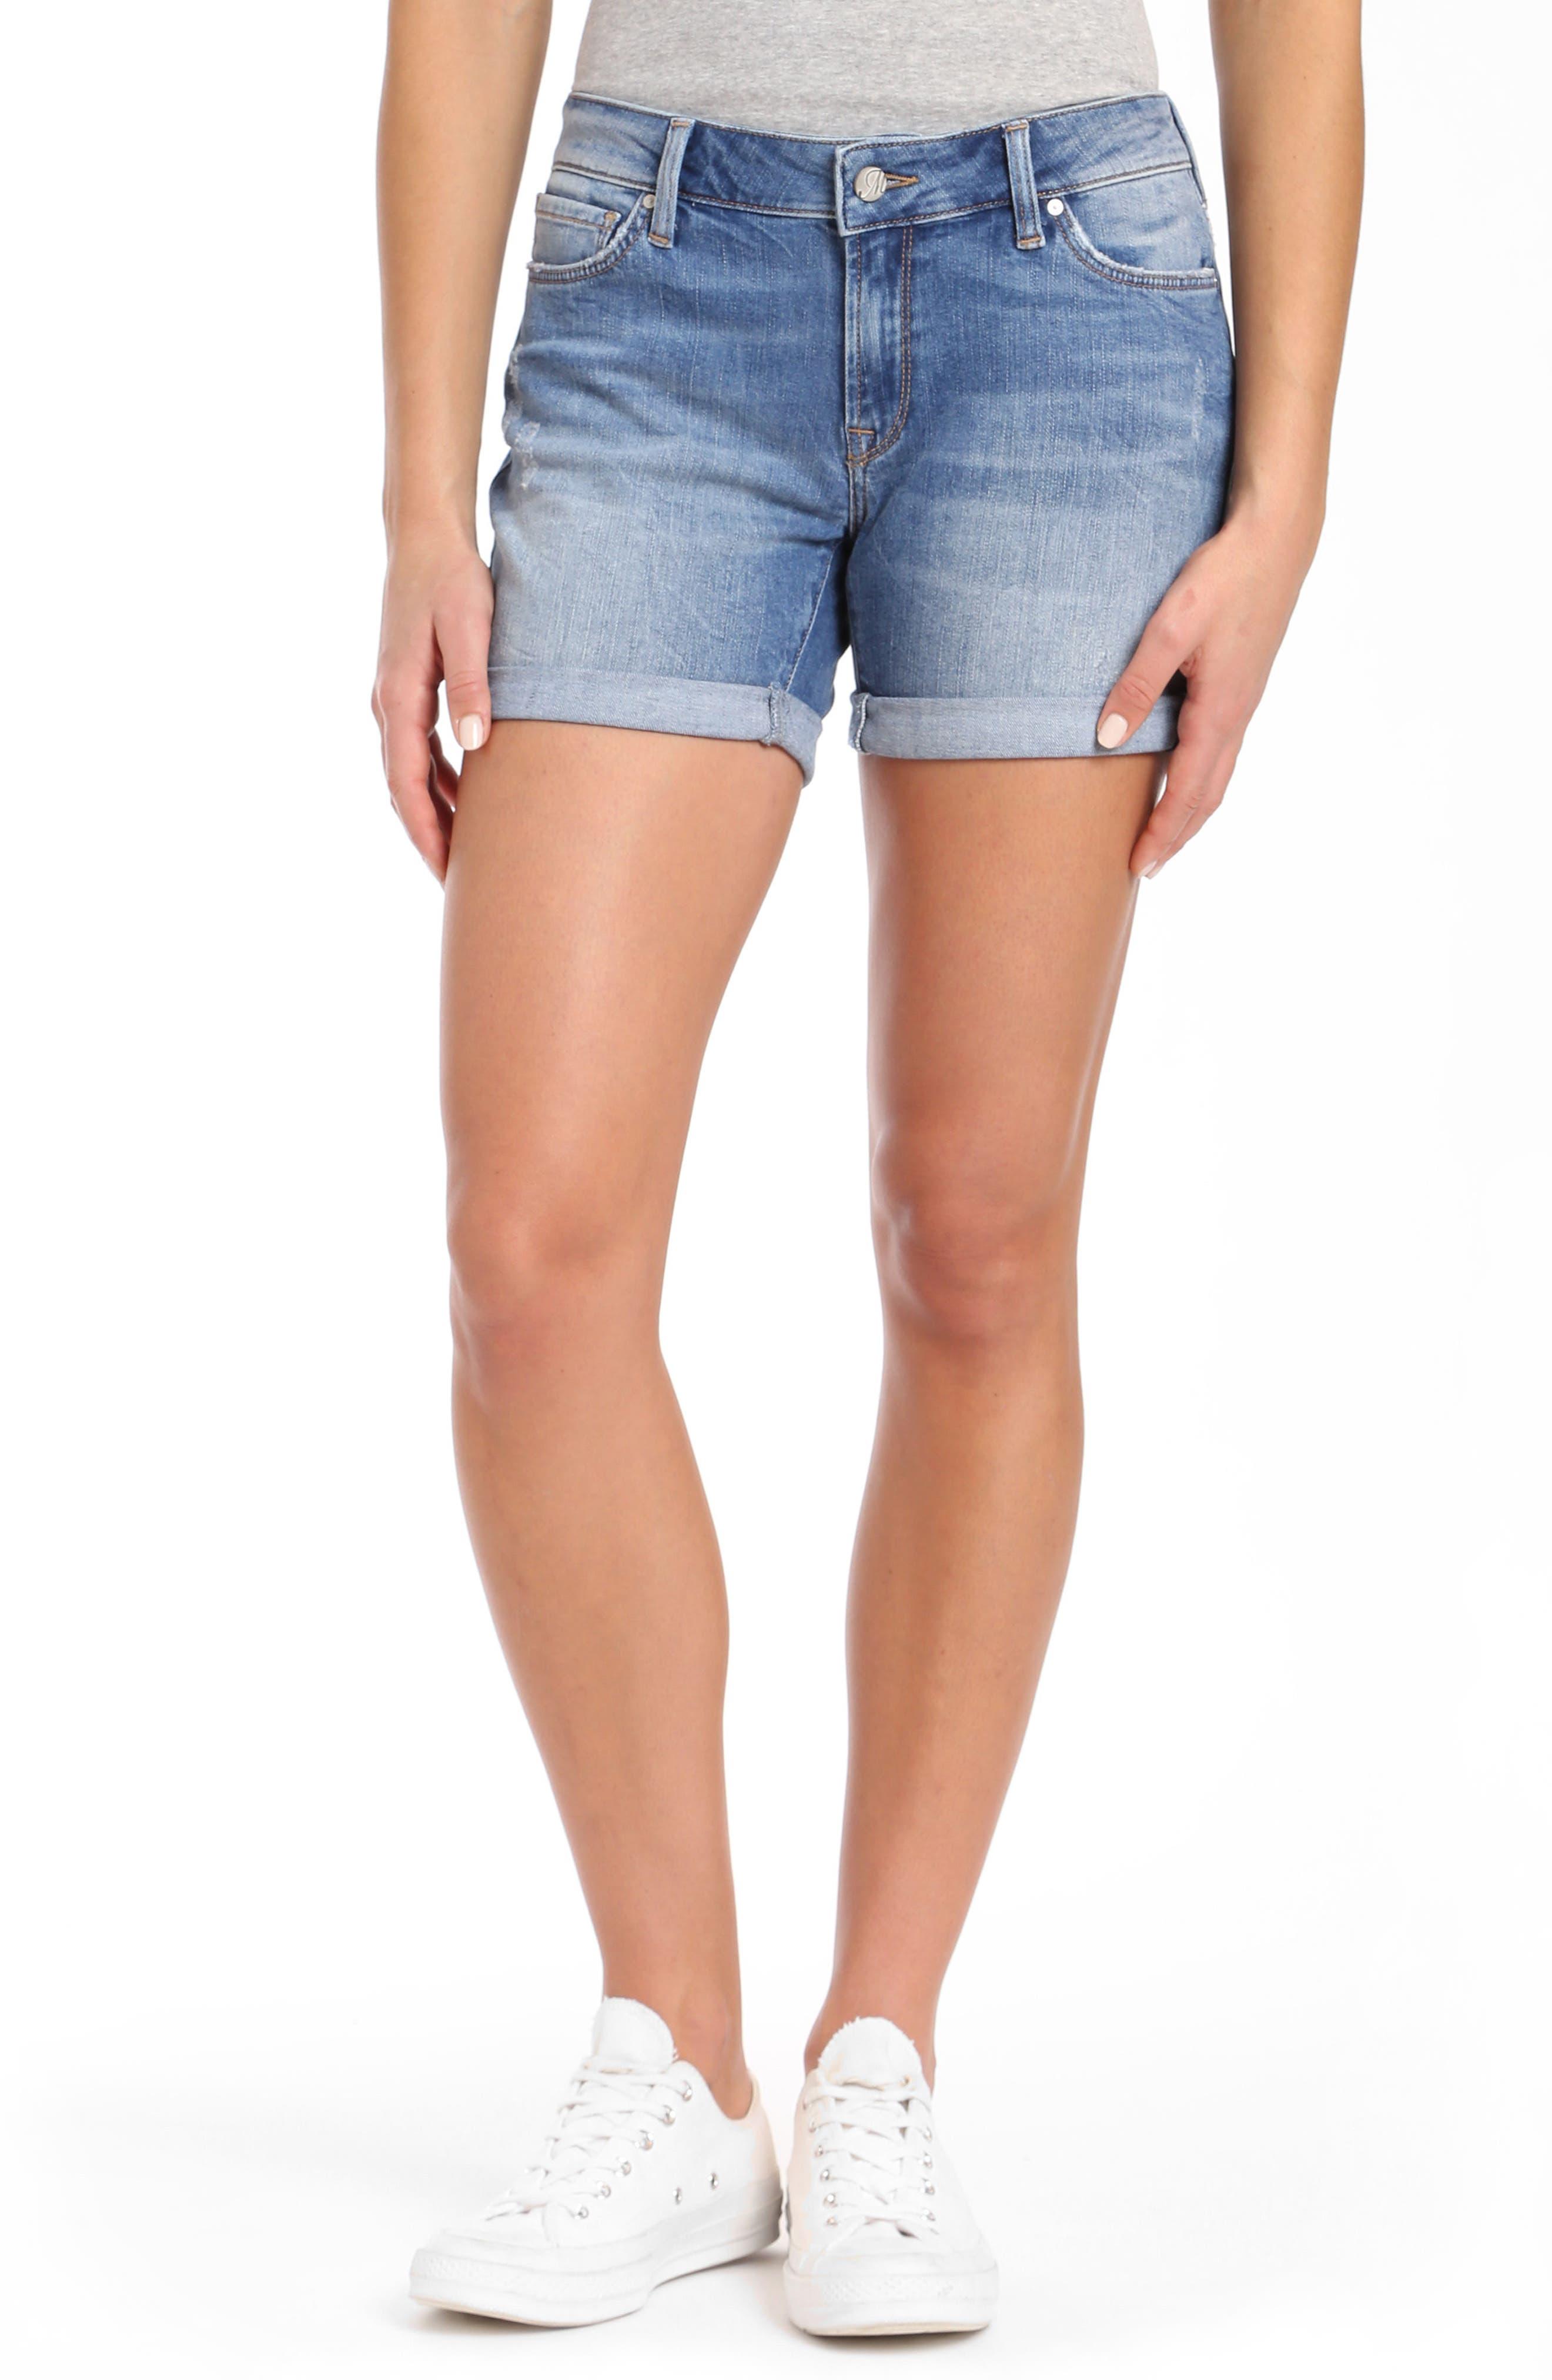 Mavi Jeans Pixie Denim Boyfriend Shorts (Distressed Vintage)